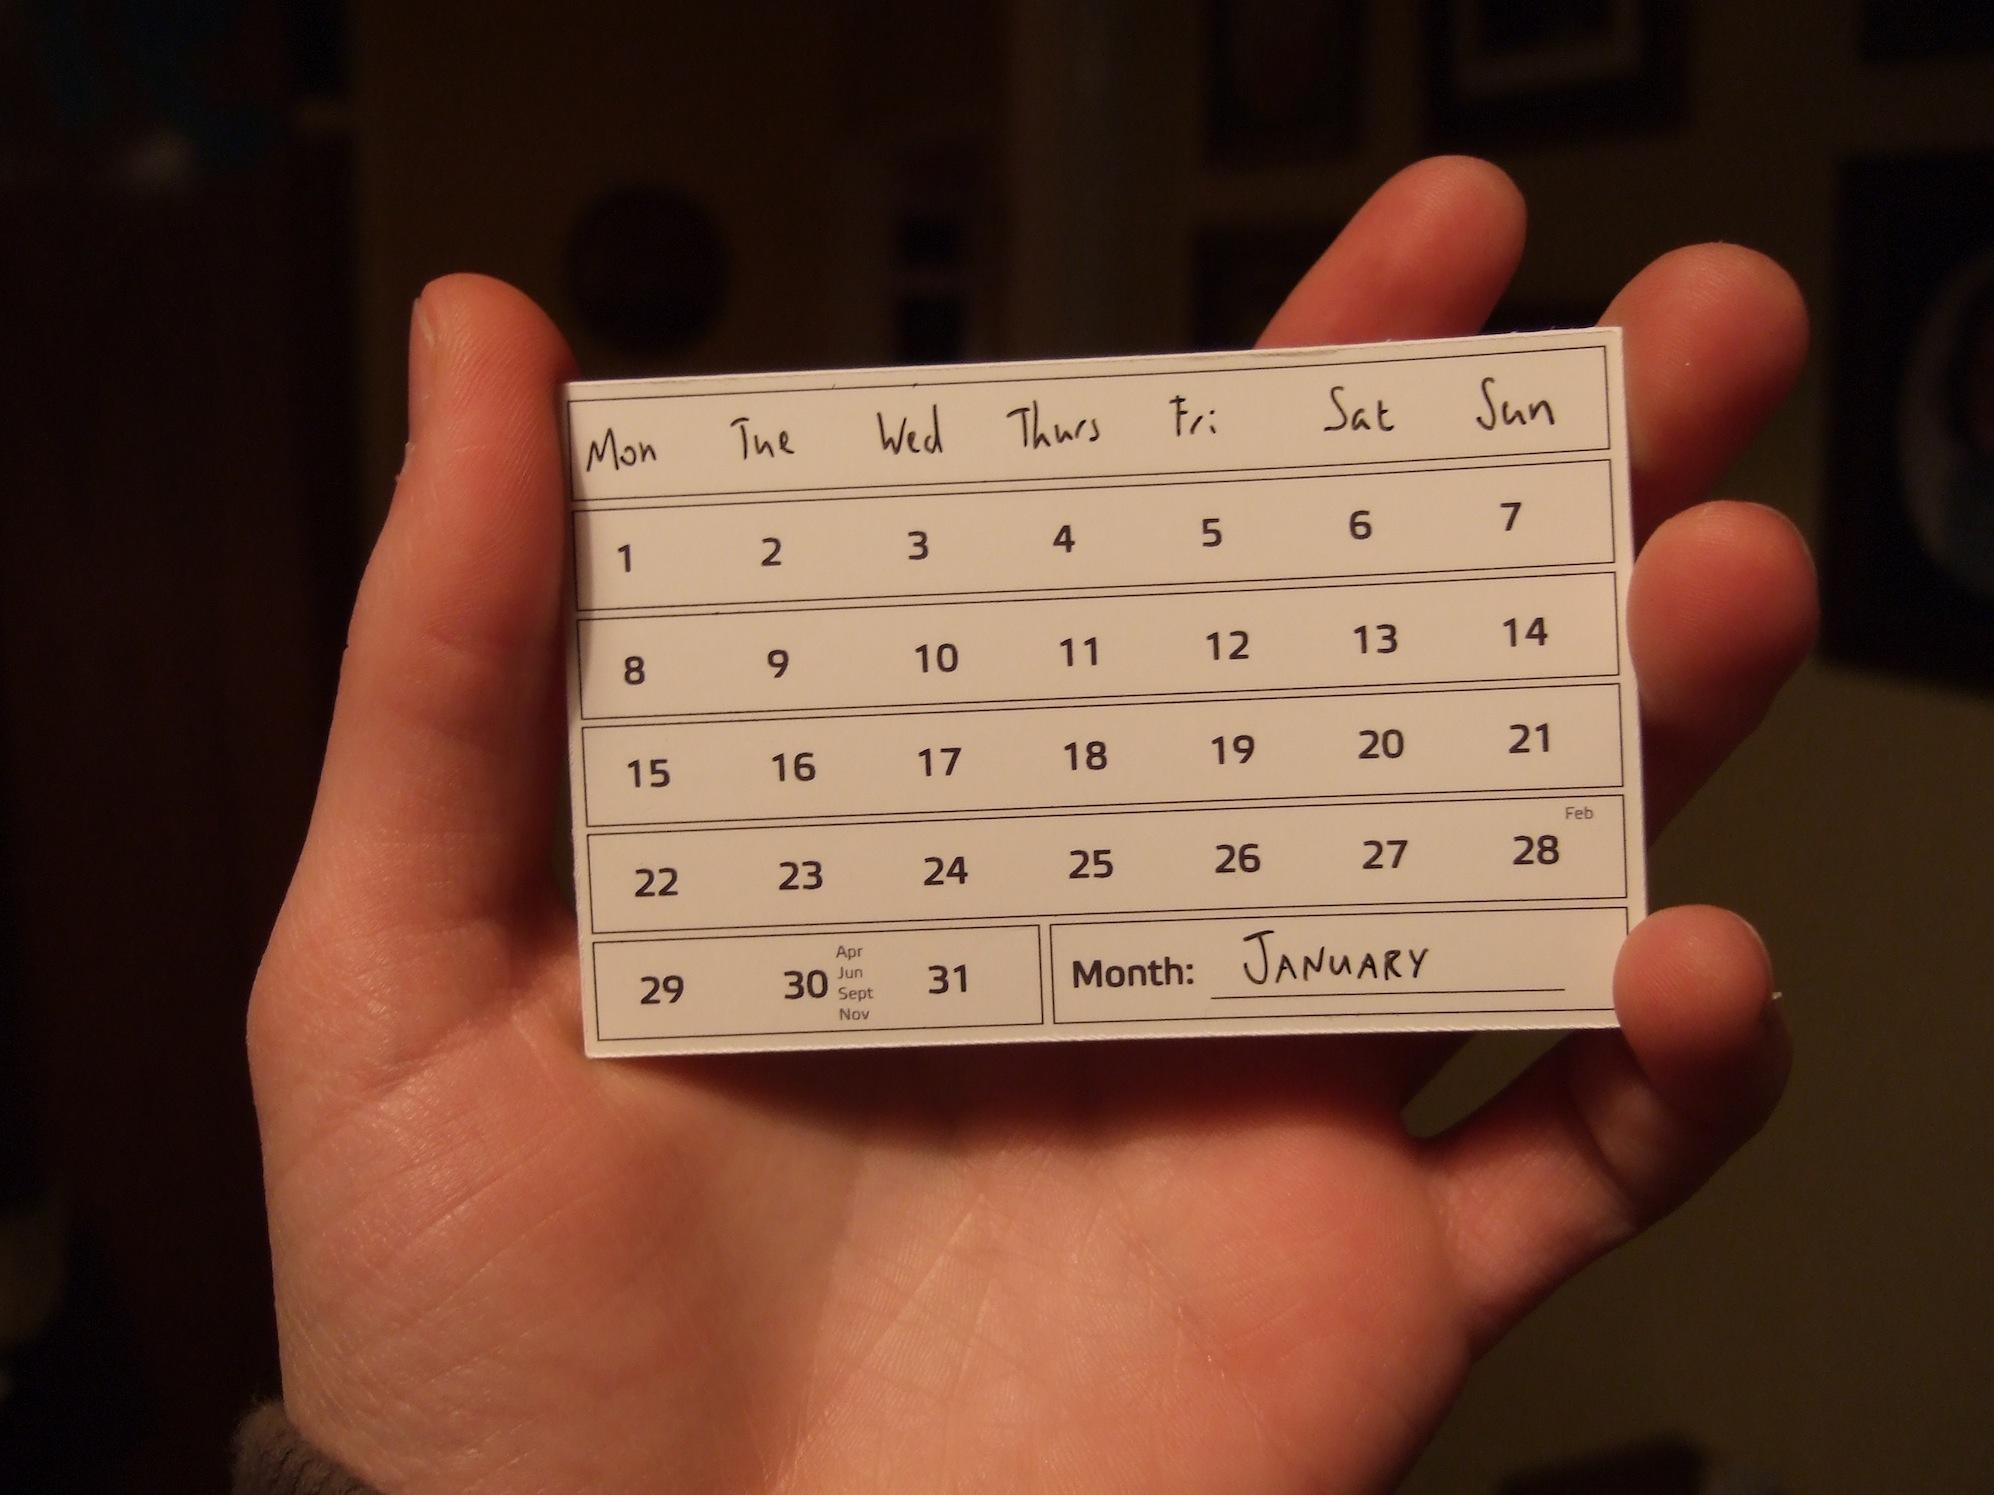 LSAT Study Schedule Calendar (attribution Joe Lanman)